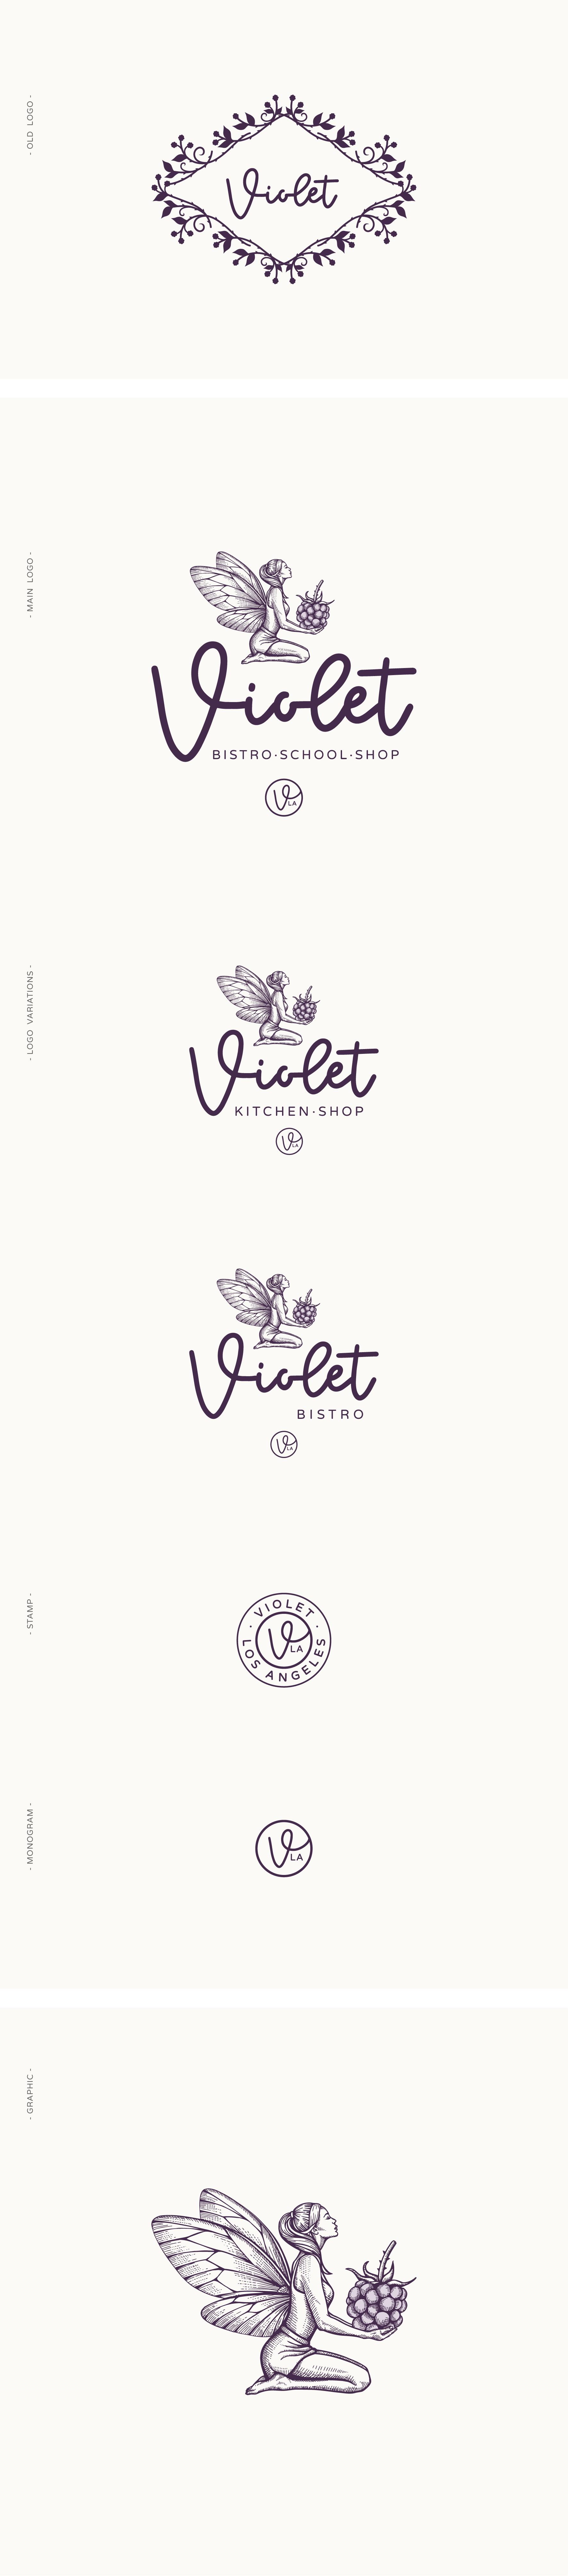 Violet Graphics